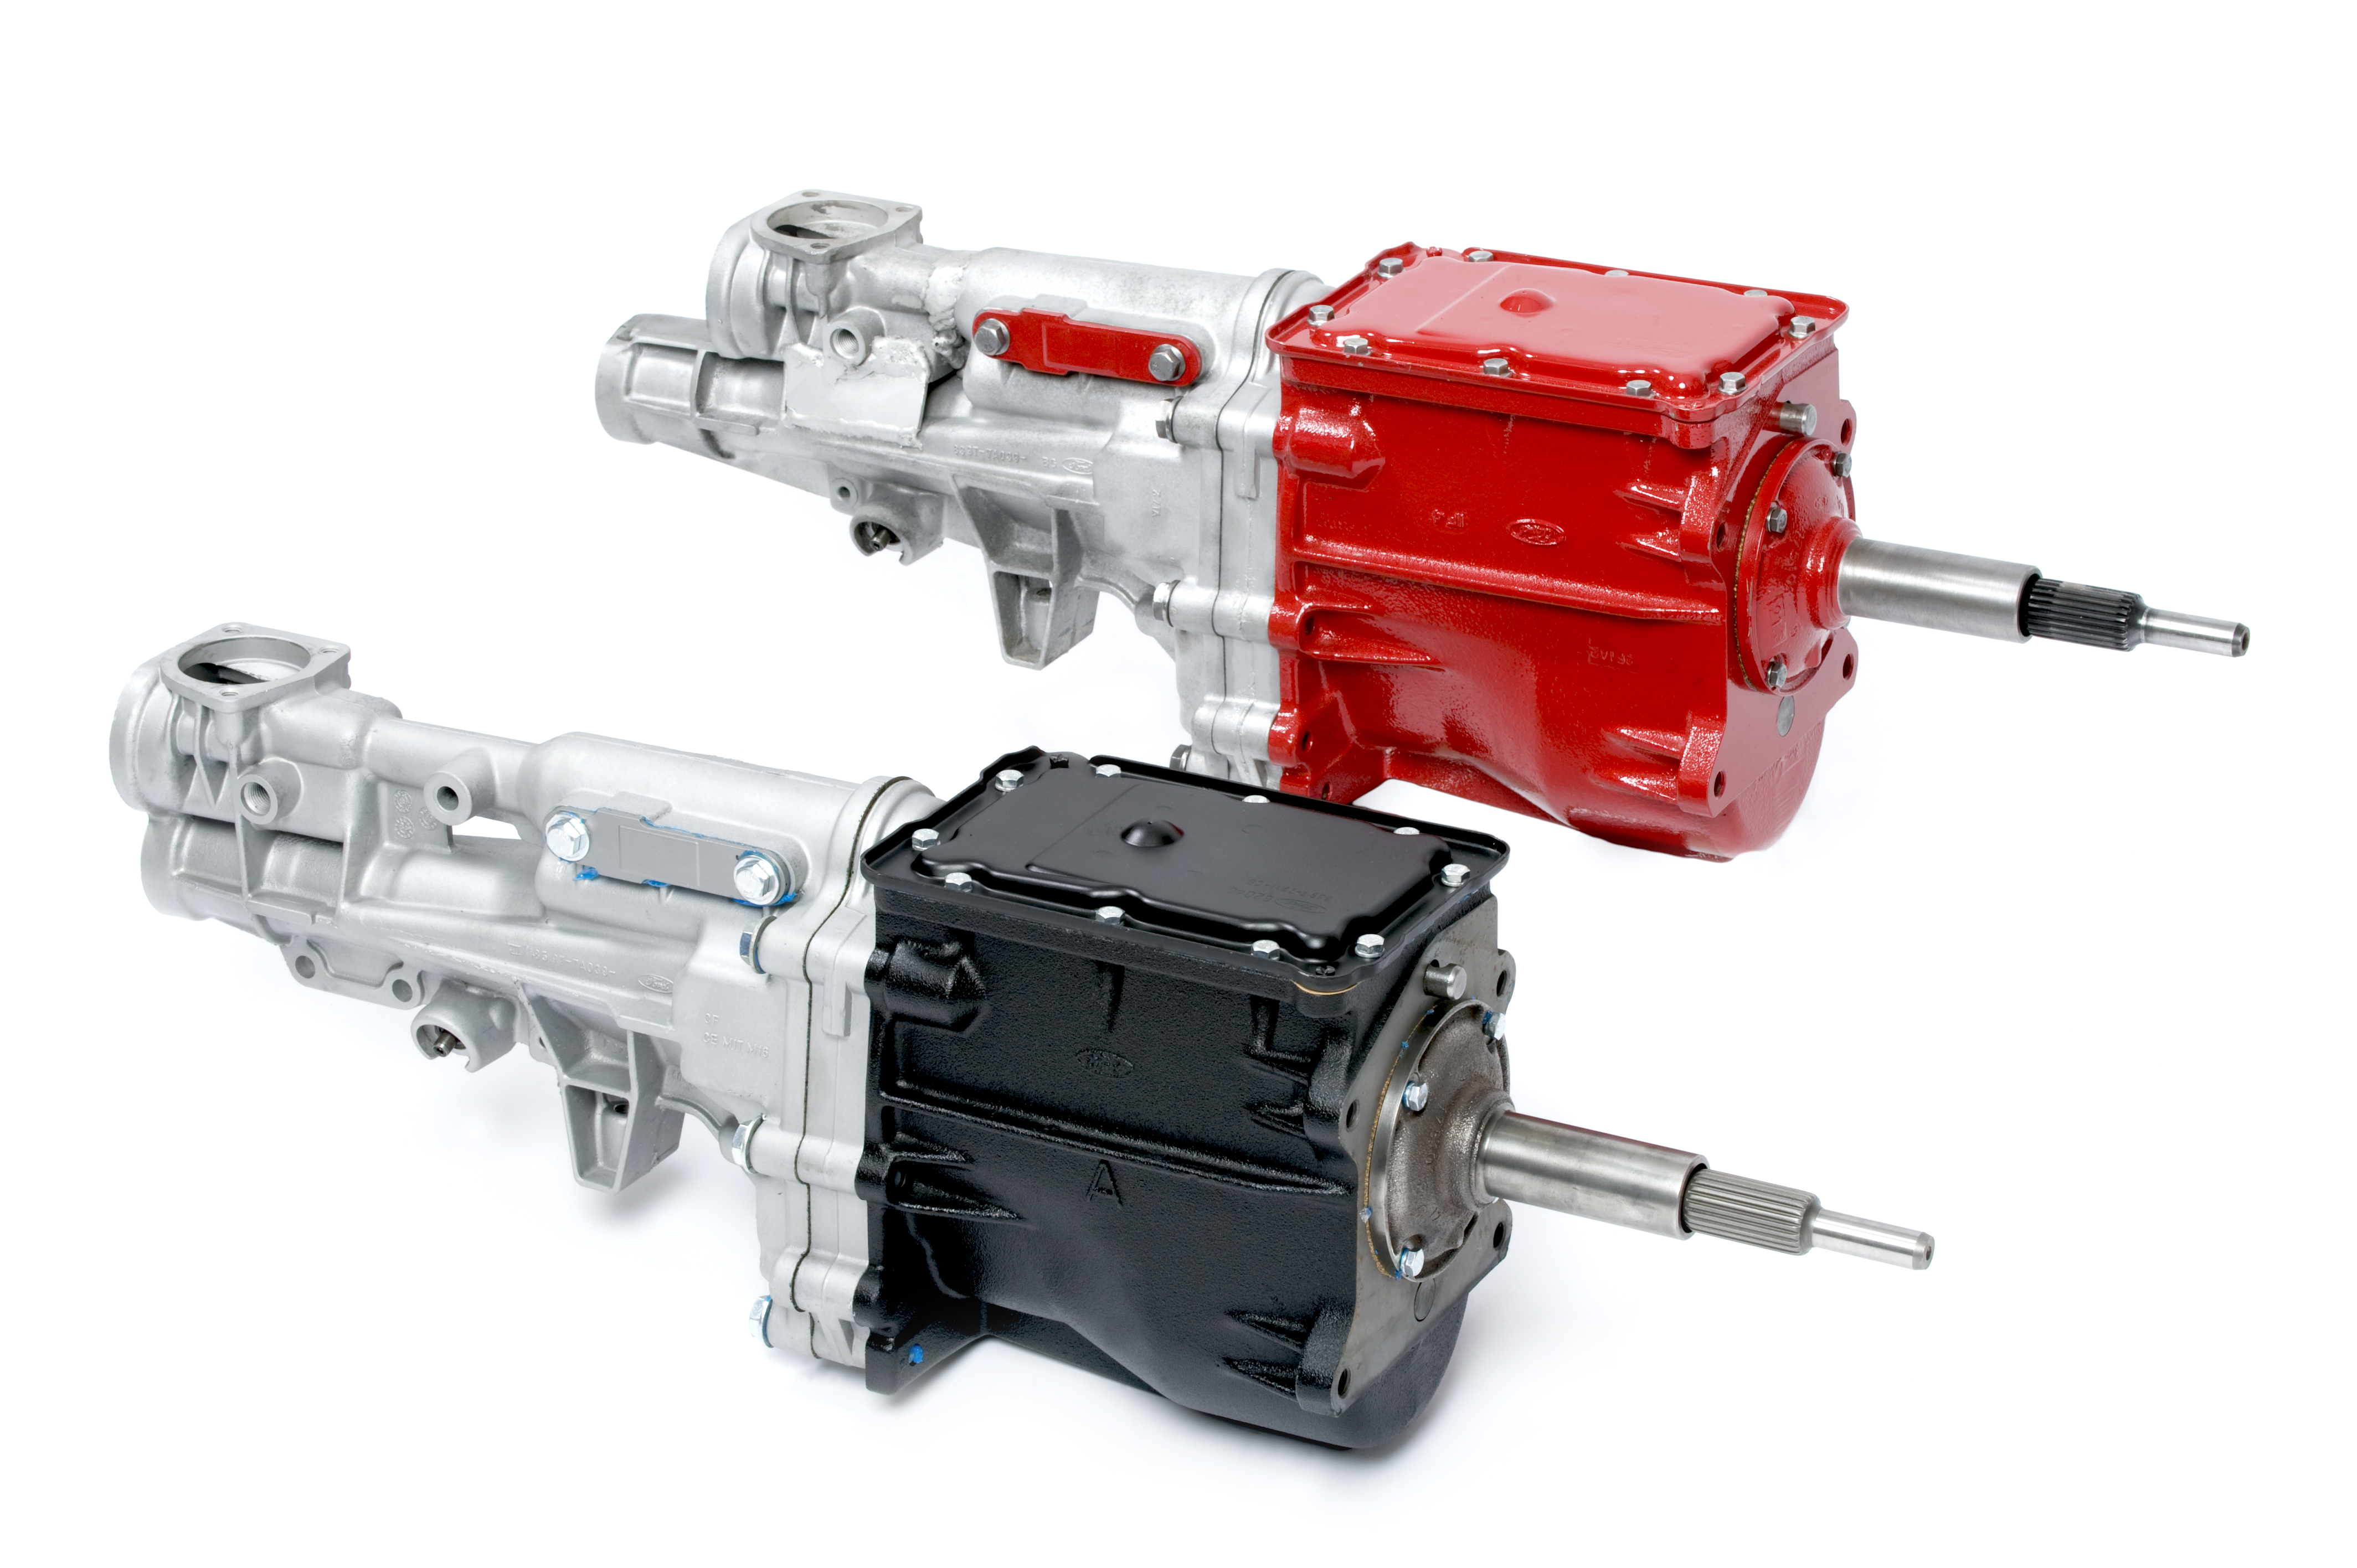 MG Midget full 5 speed gearbox kit 1500cc - Frontline Developments